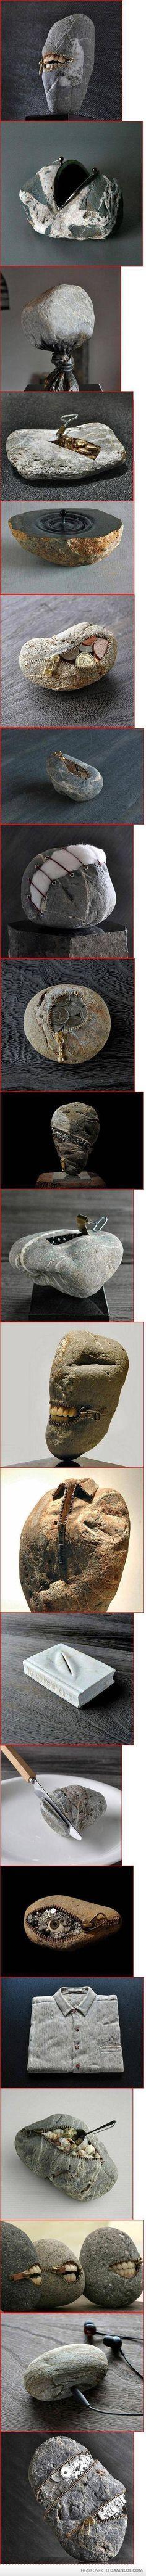 awesome rock art